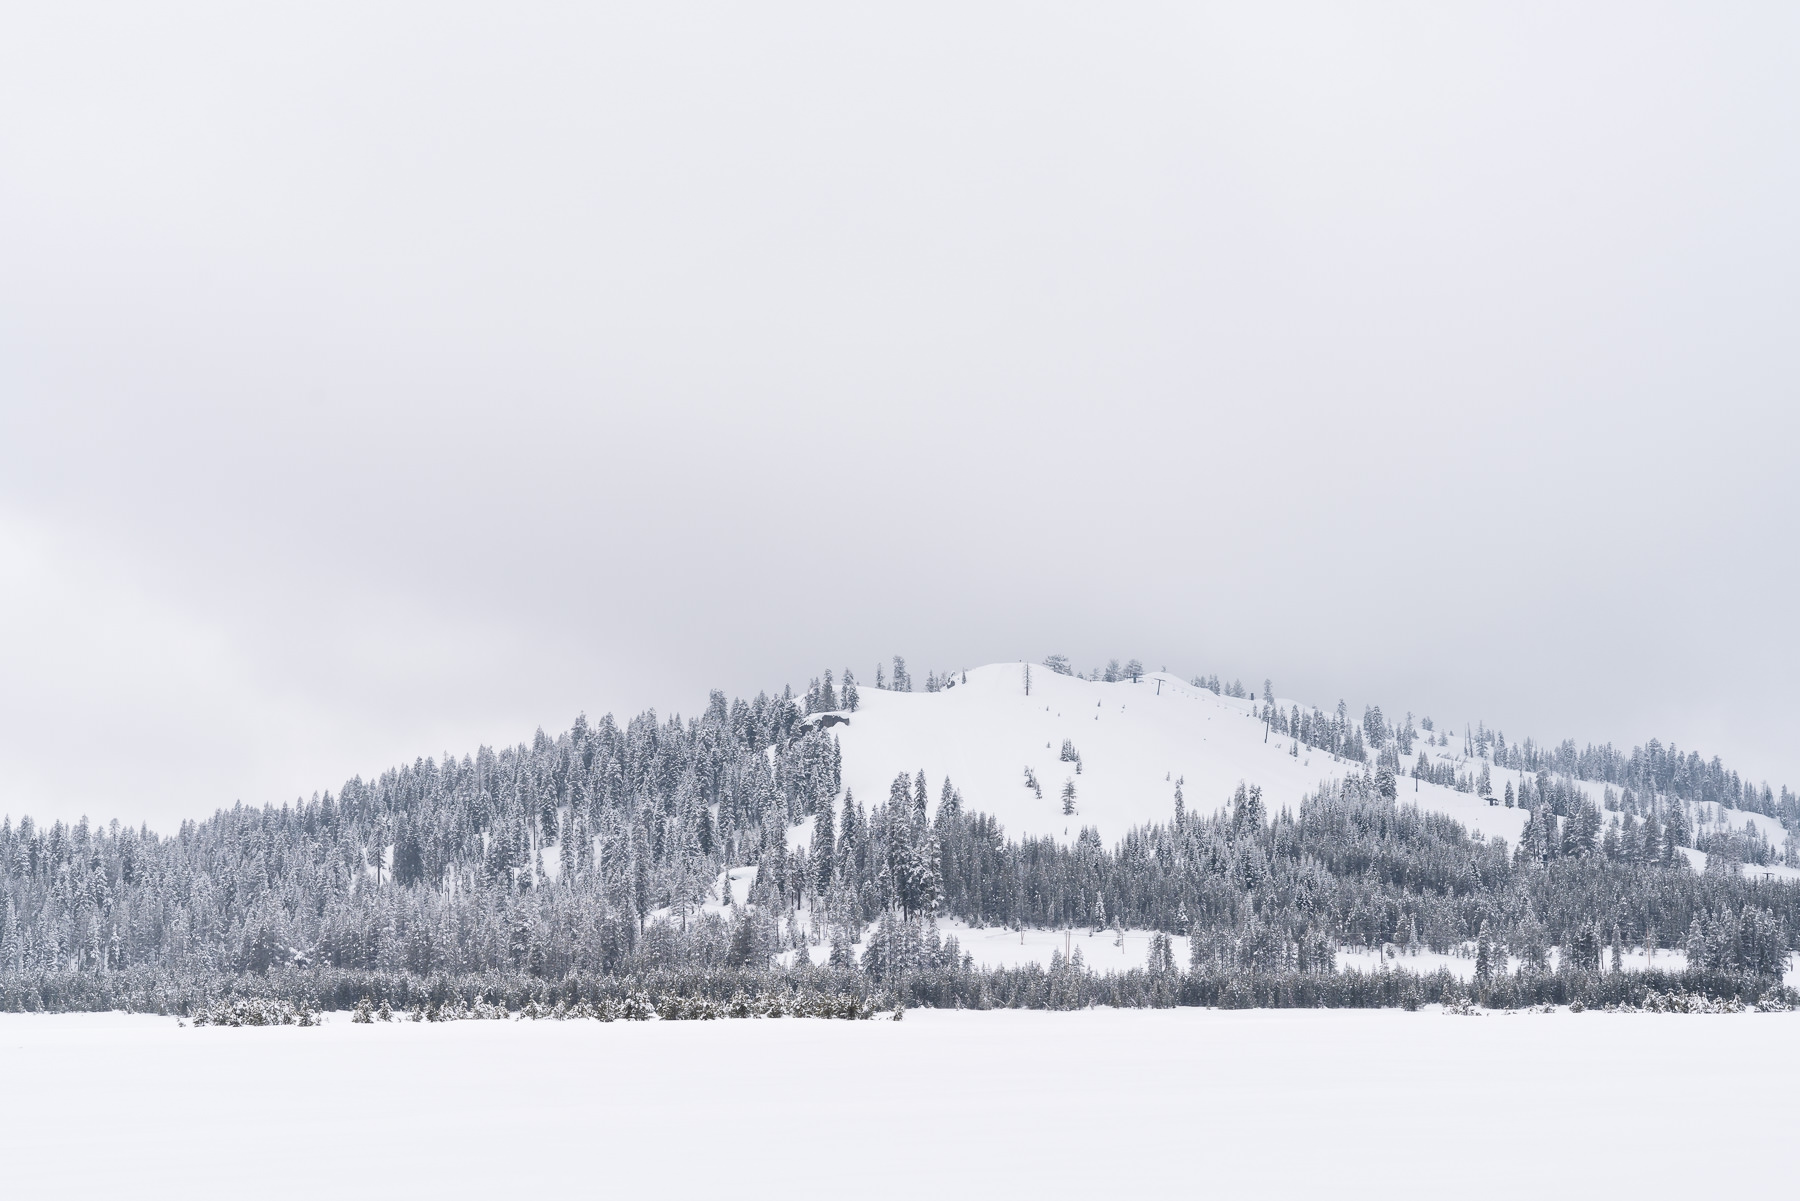 2019.03.23 Snowy Tahoe © Jennifer Carr Photography-20.jpg